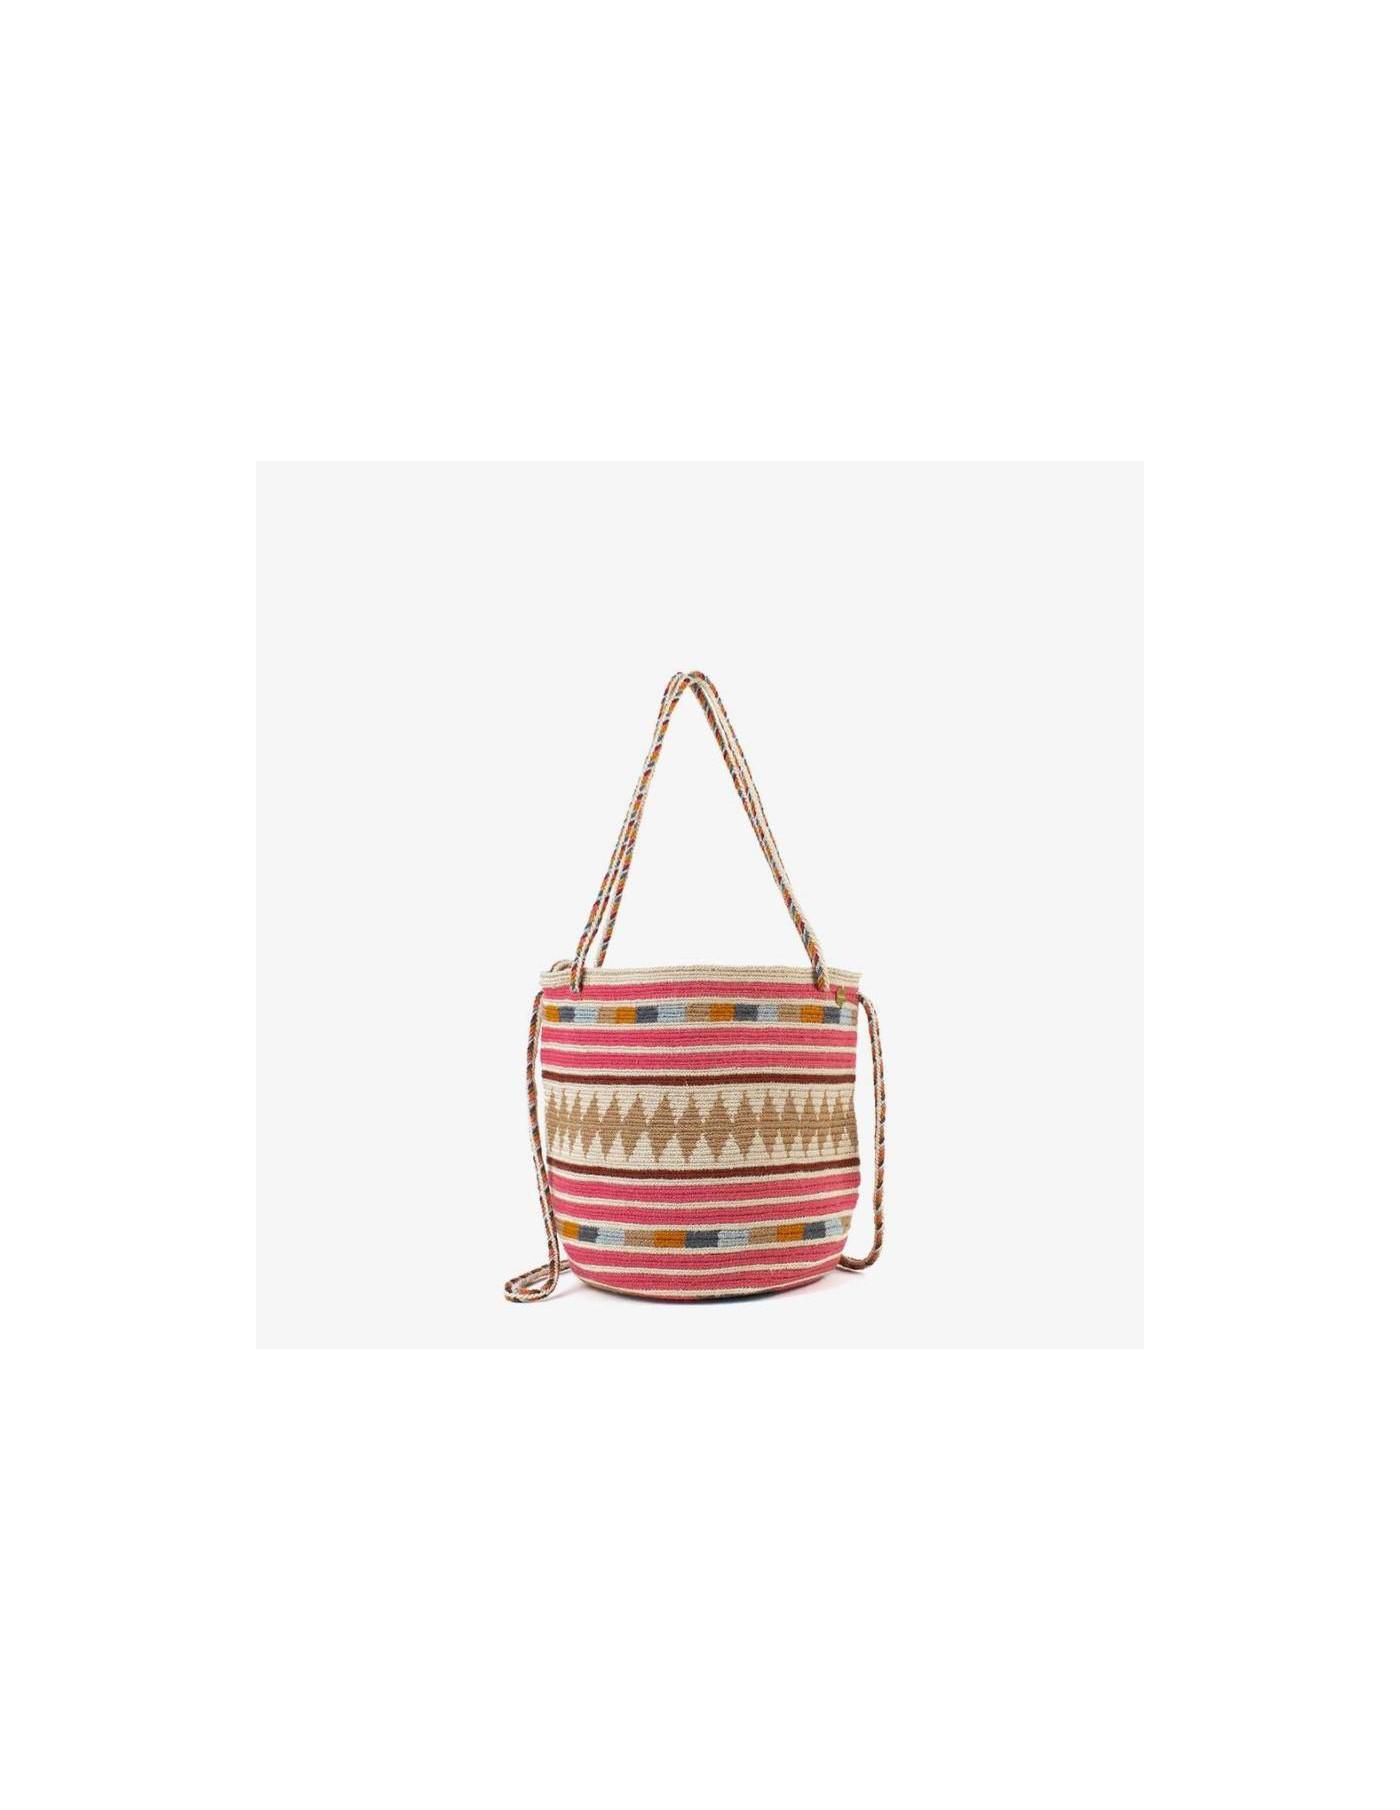 GUANA Handmade Bag